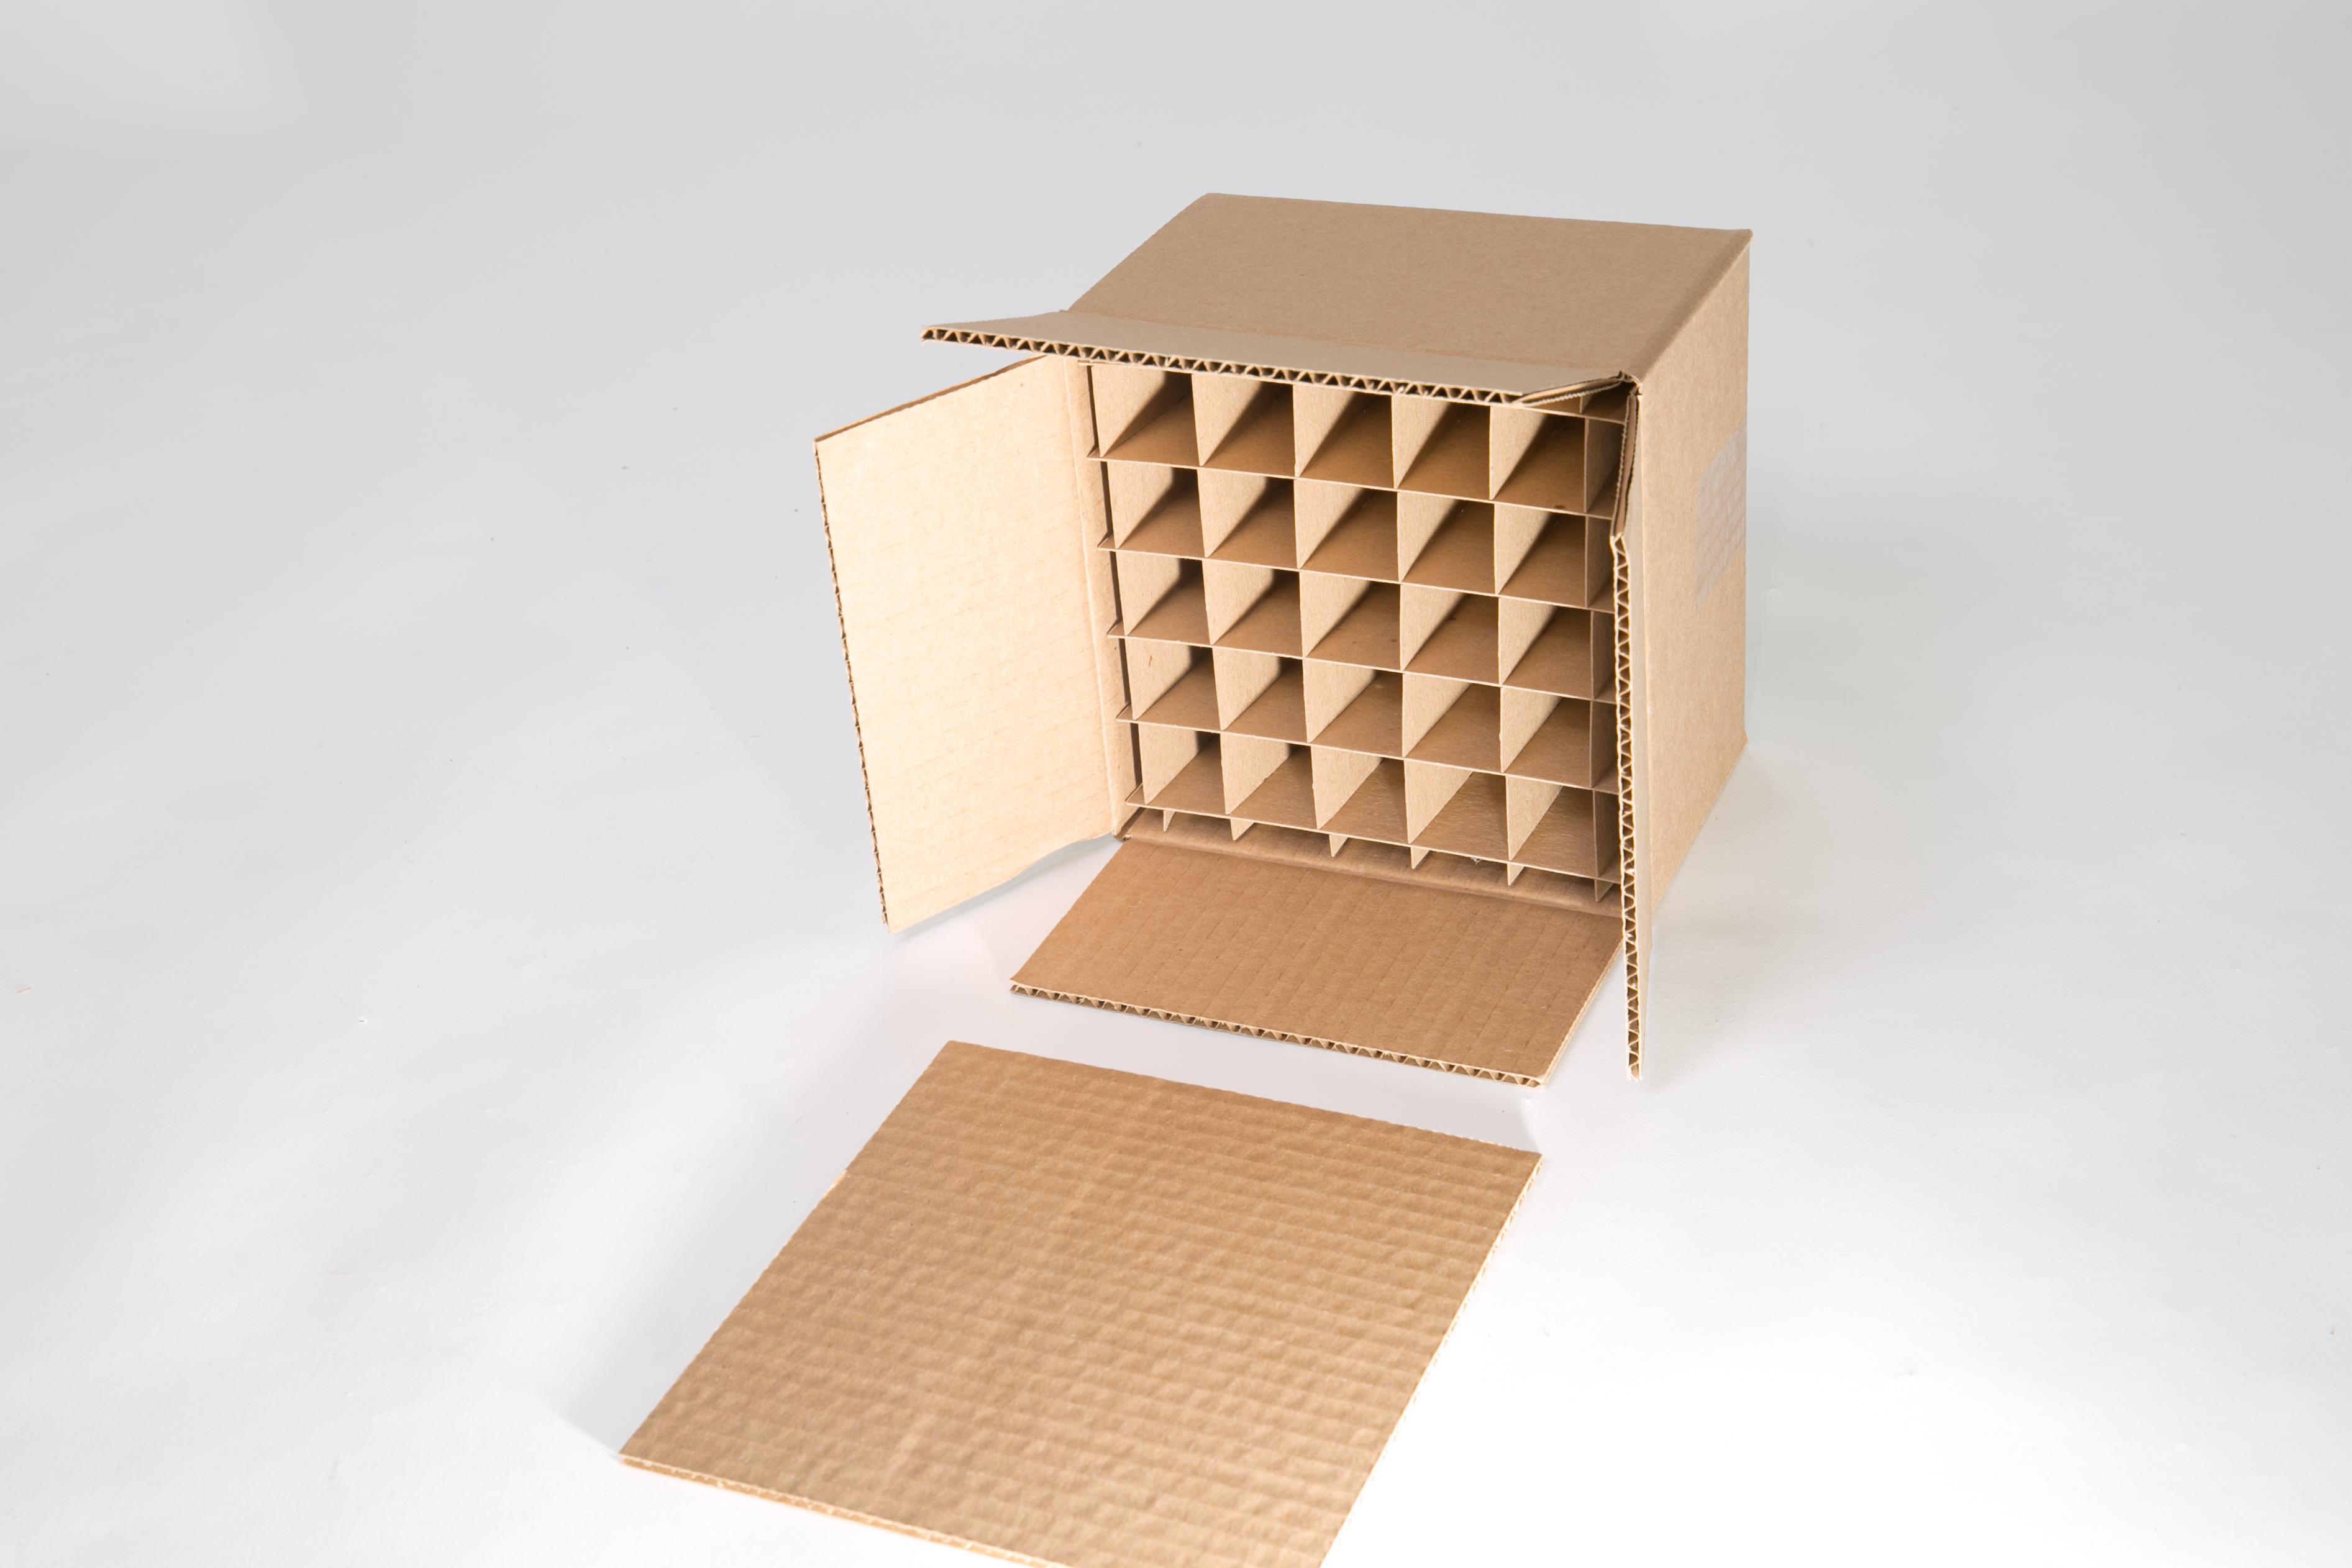 25 Count Box